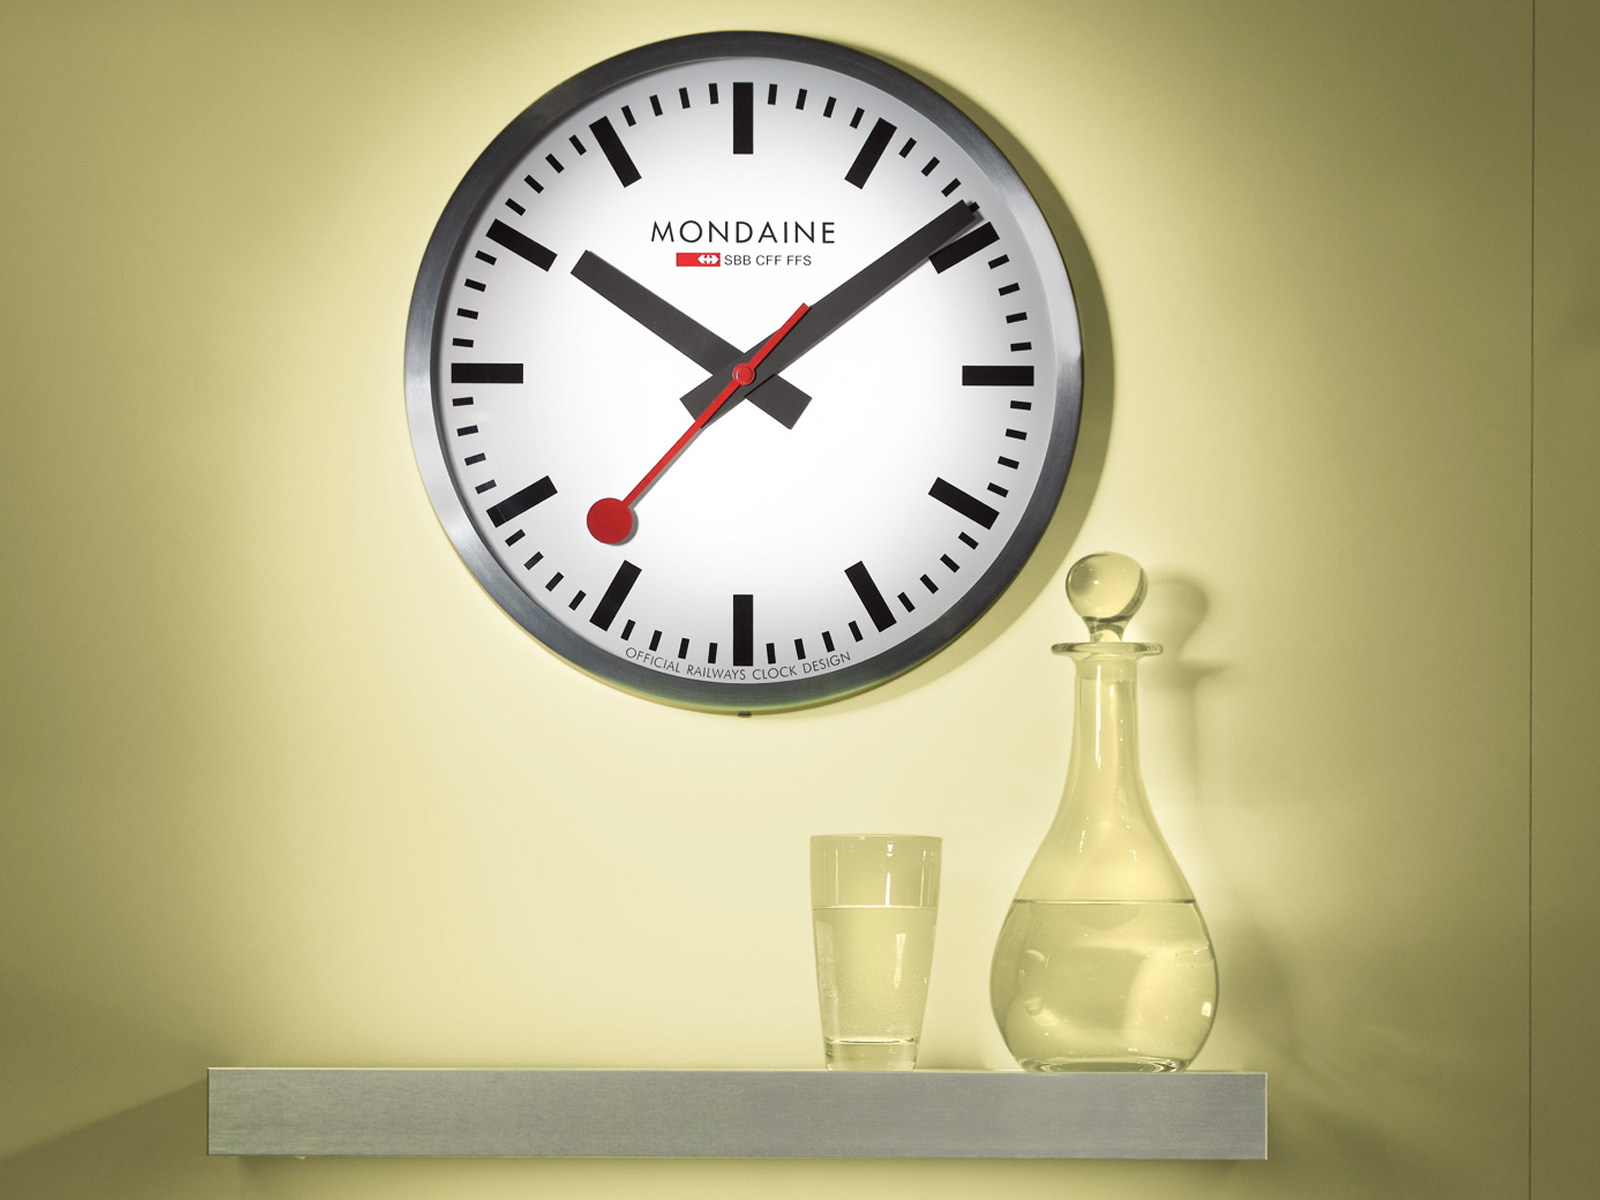 Mondaine-Railway-clock